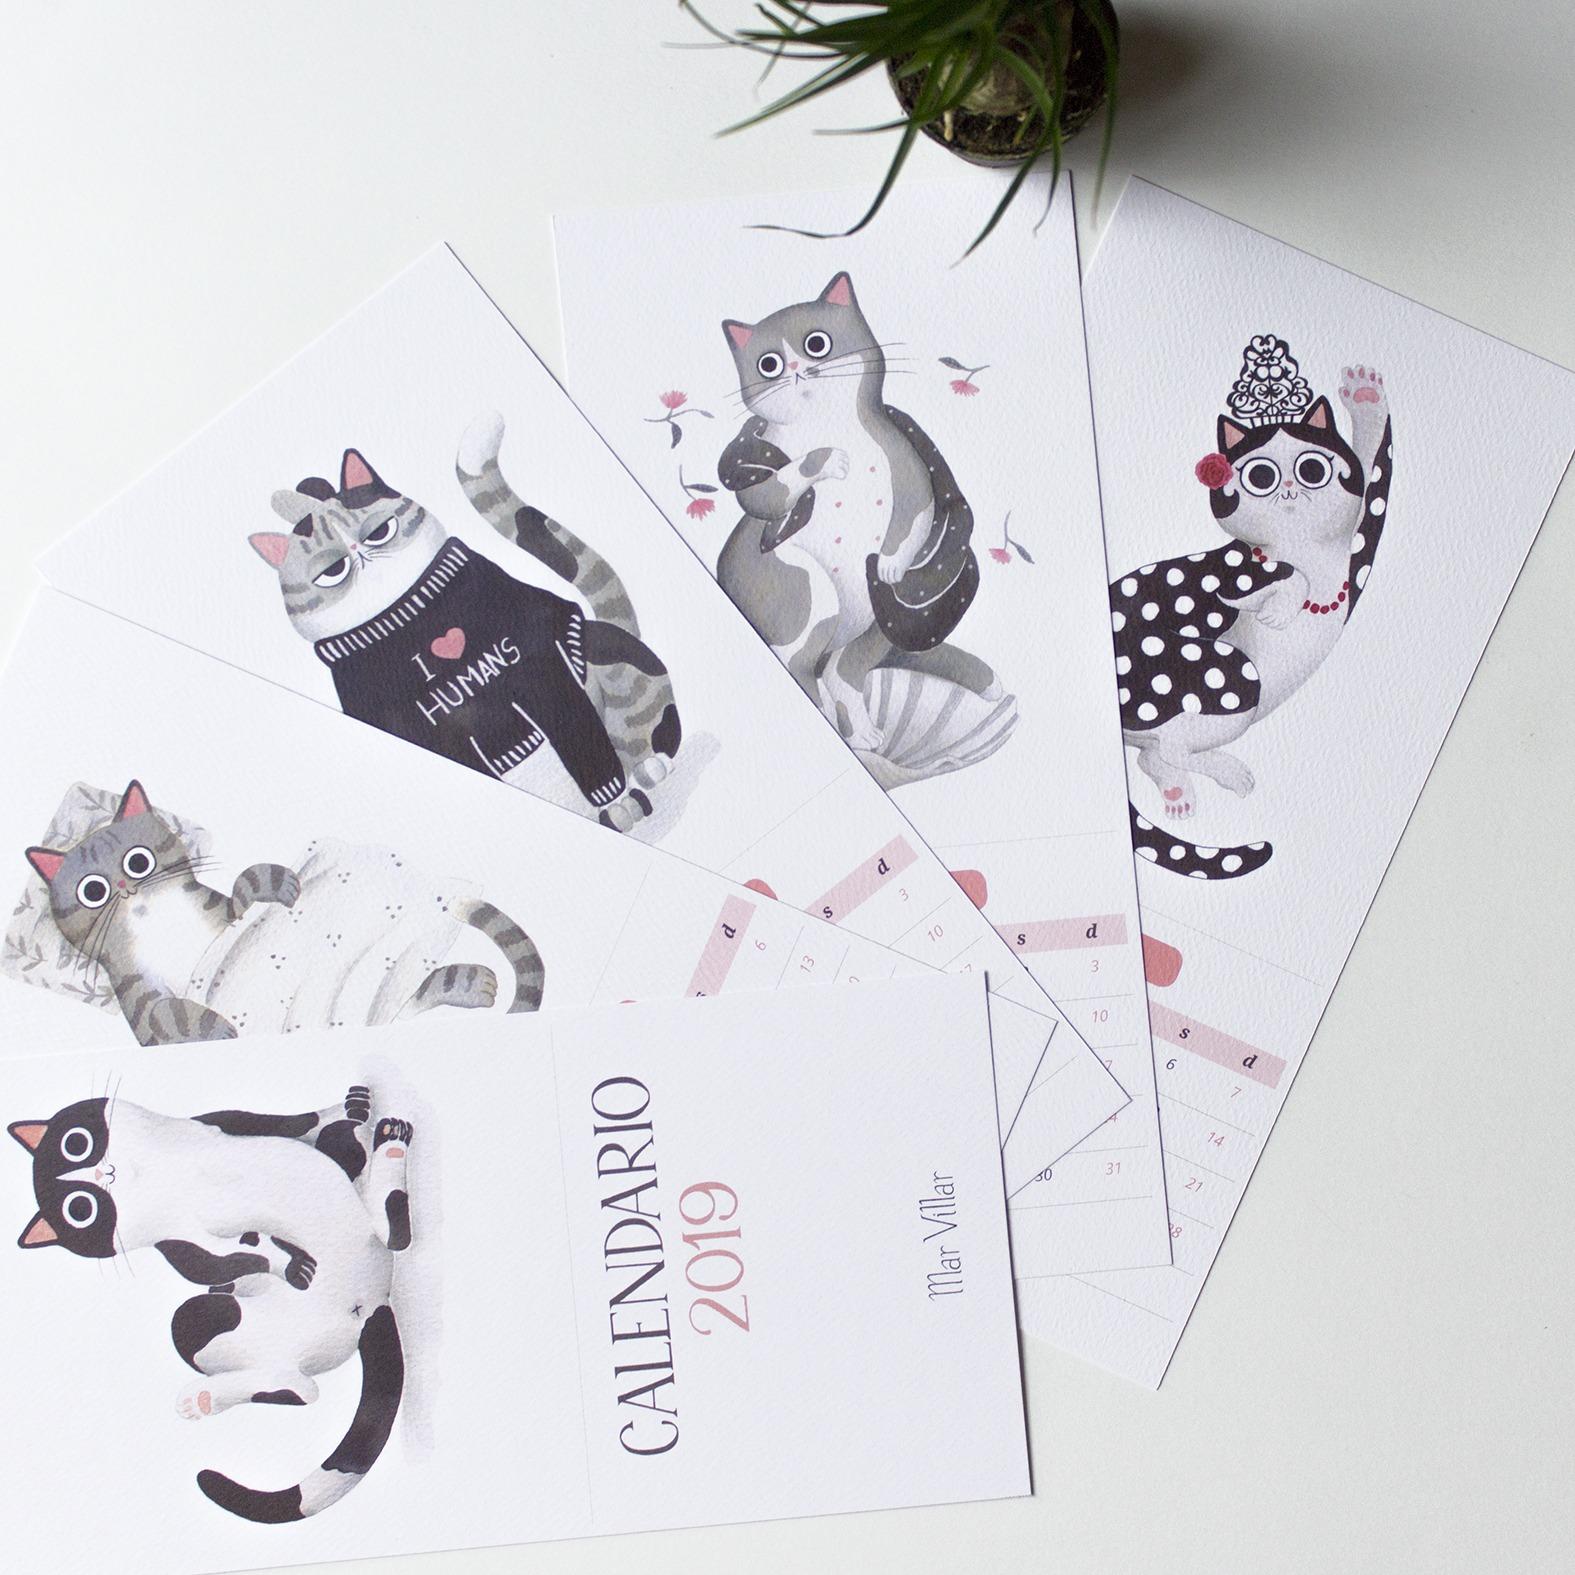 calendario 2019, calendario ilustrado 2019, calendario de gatos 2019, calendario de gatos, ilustración de gato, dibujo de gato, dibujo de gato a tinta